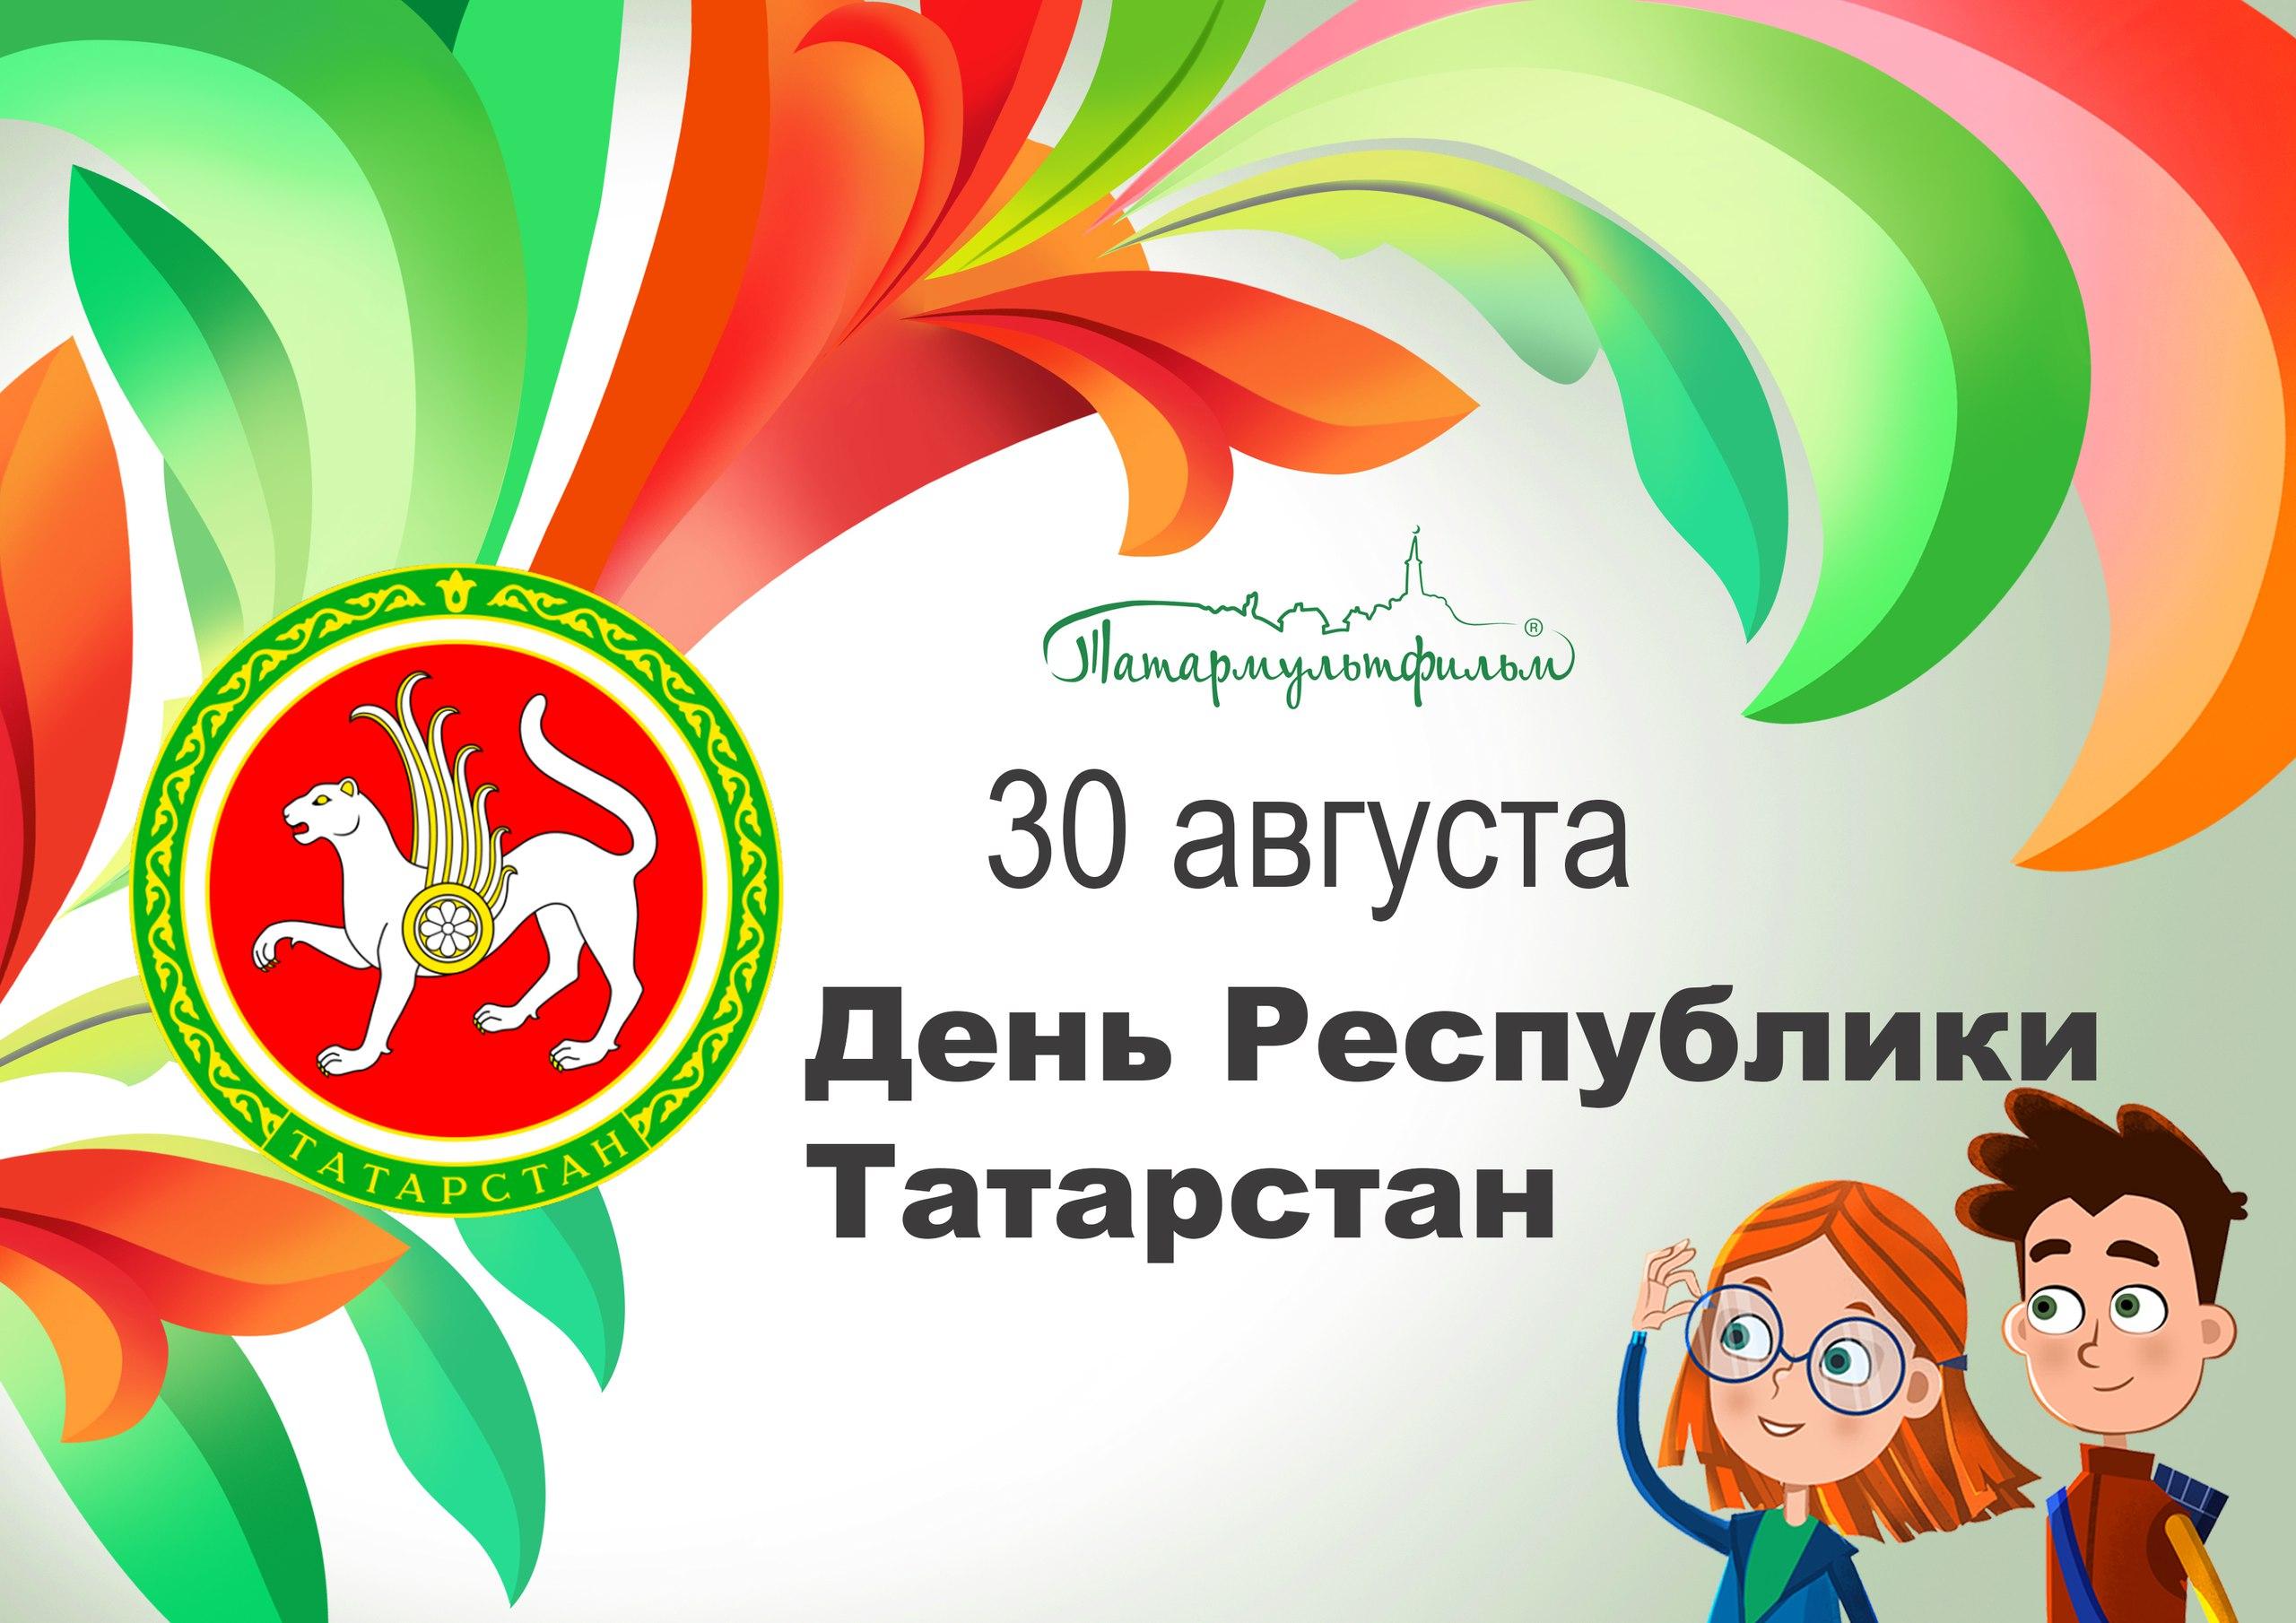 Текст поздравления с днем республики татарстан 68